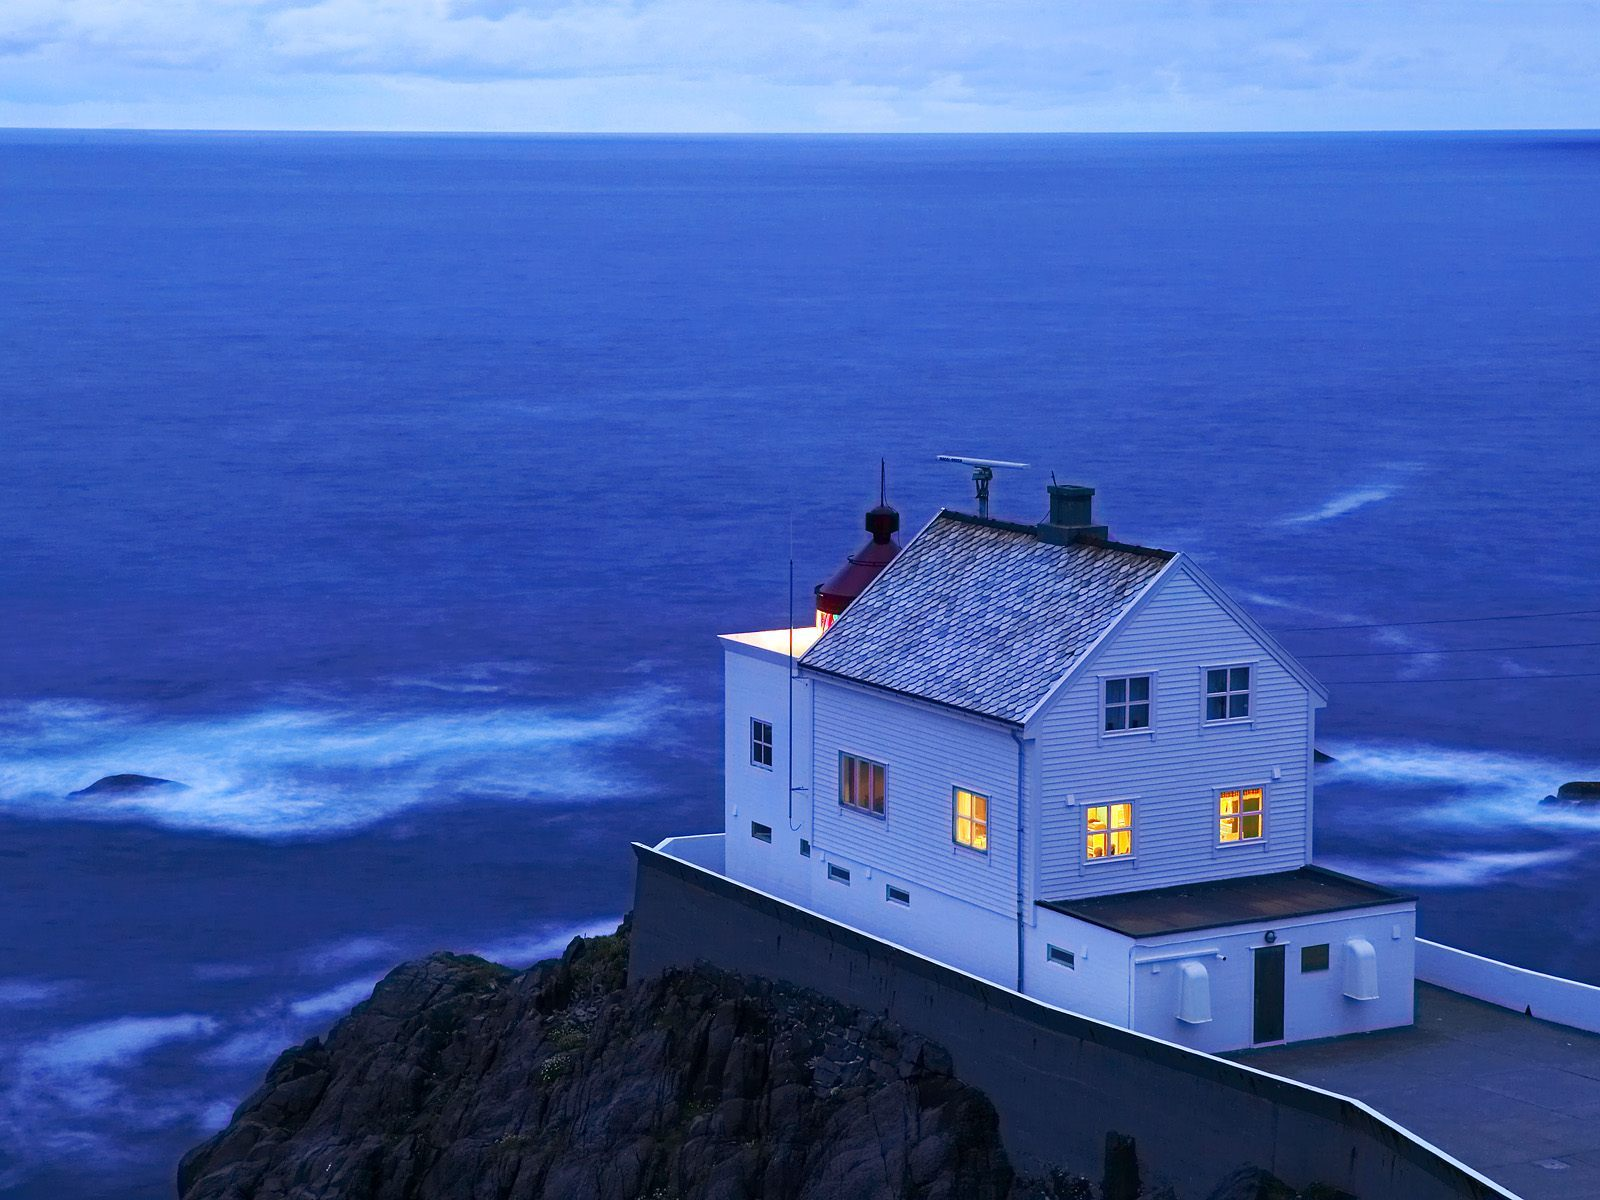 Домик над морем  № 939615 бесплатно